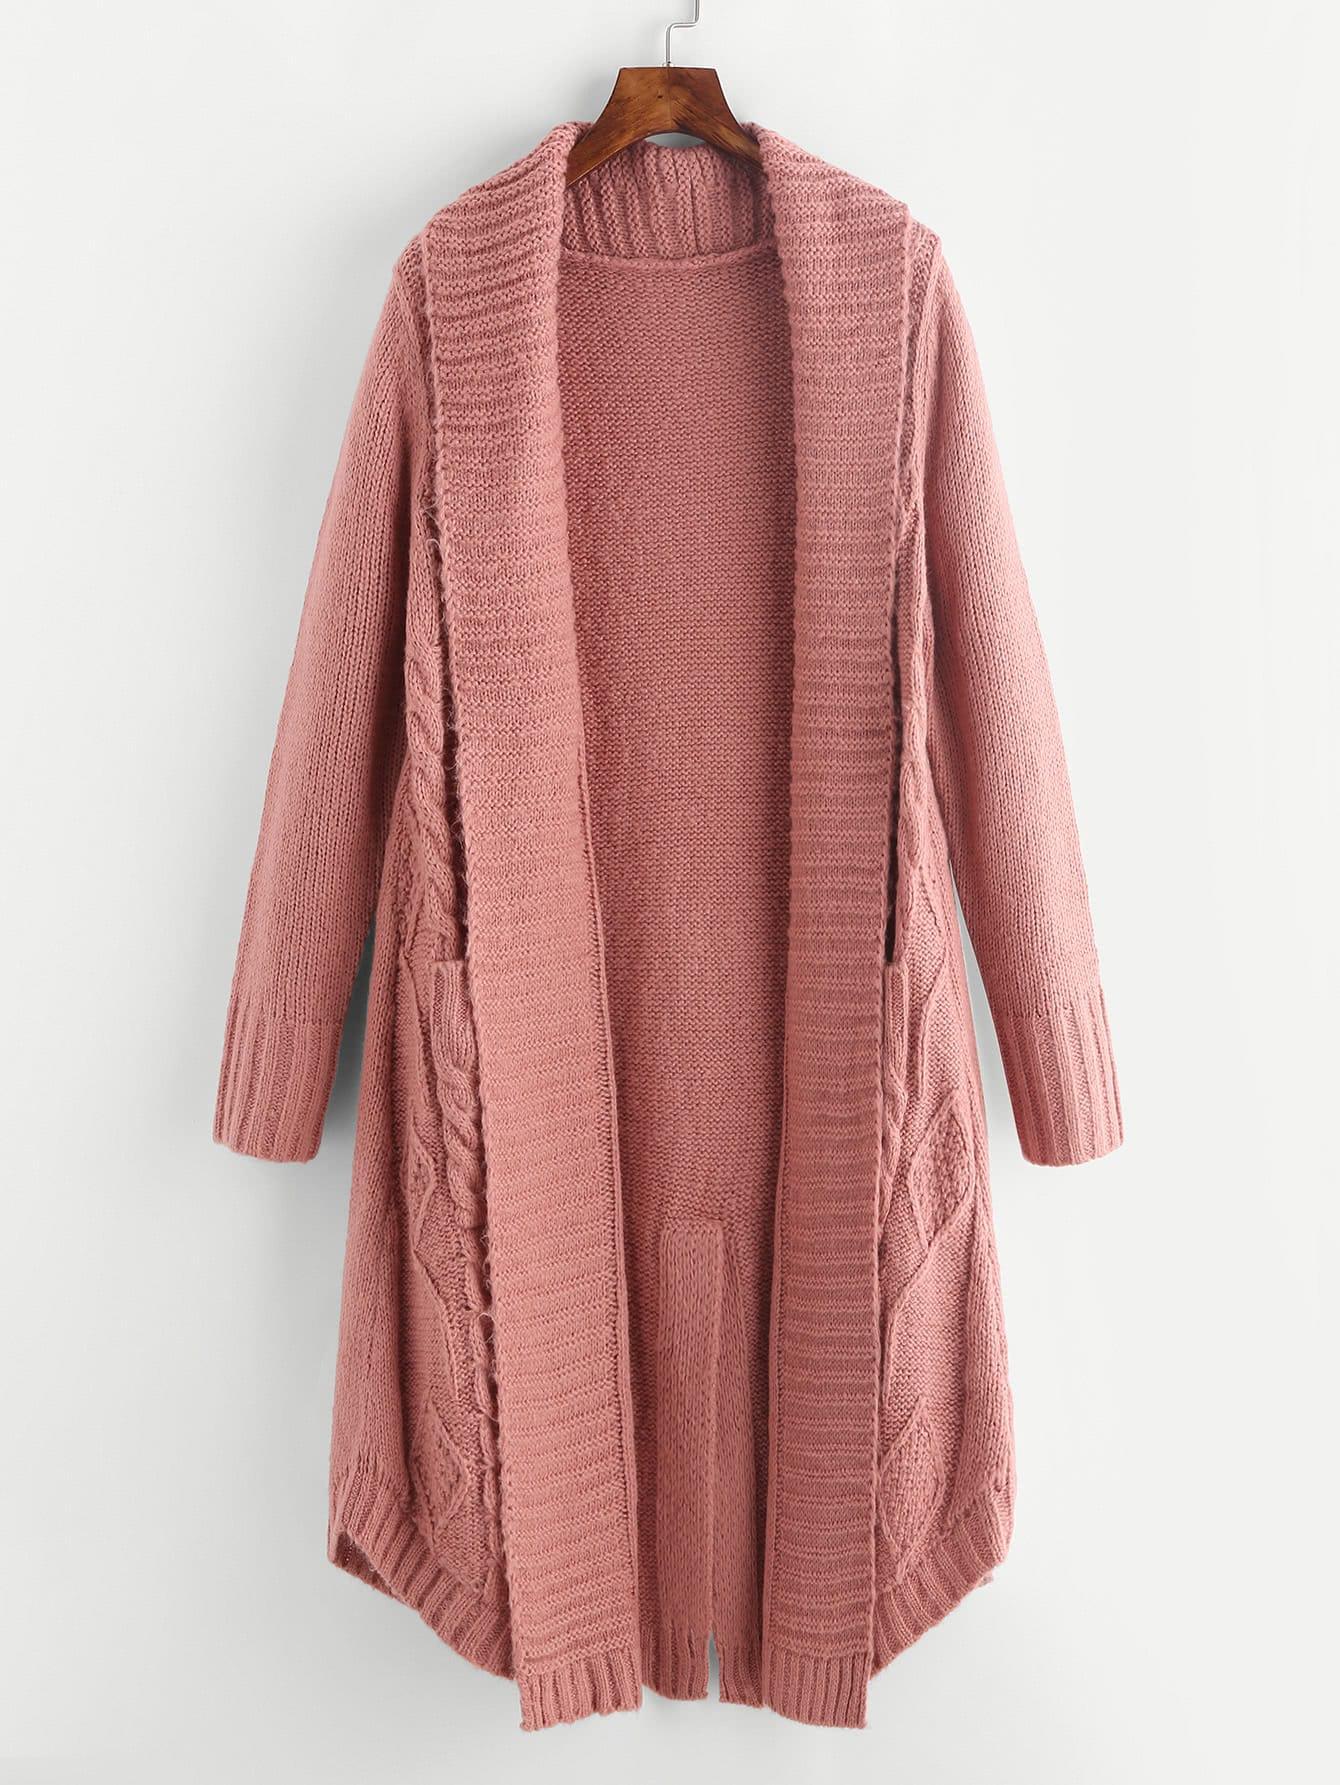 Split Back Ribbed Knit Cardigan sweater170823414